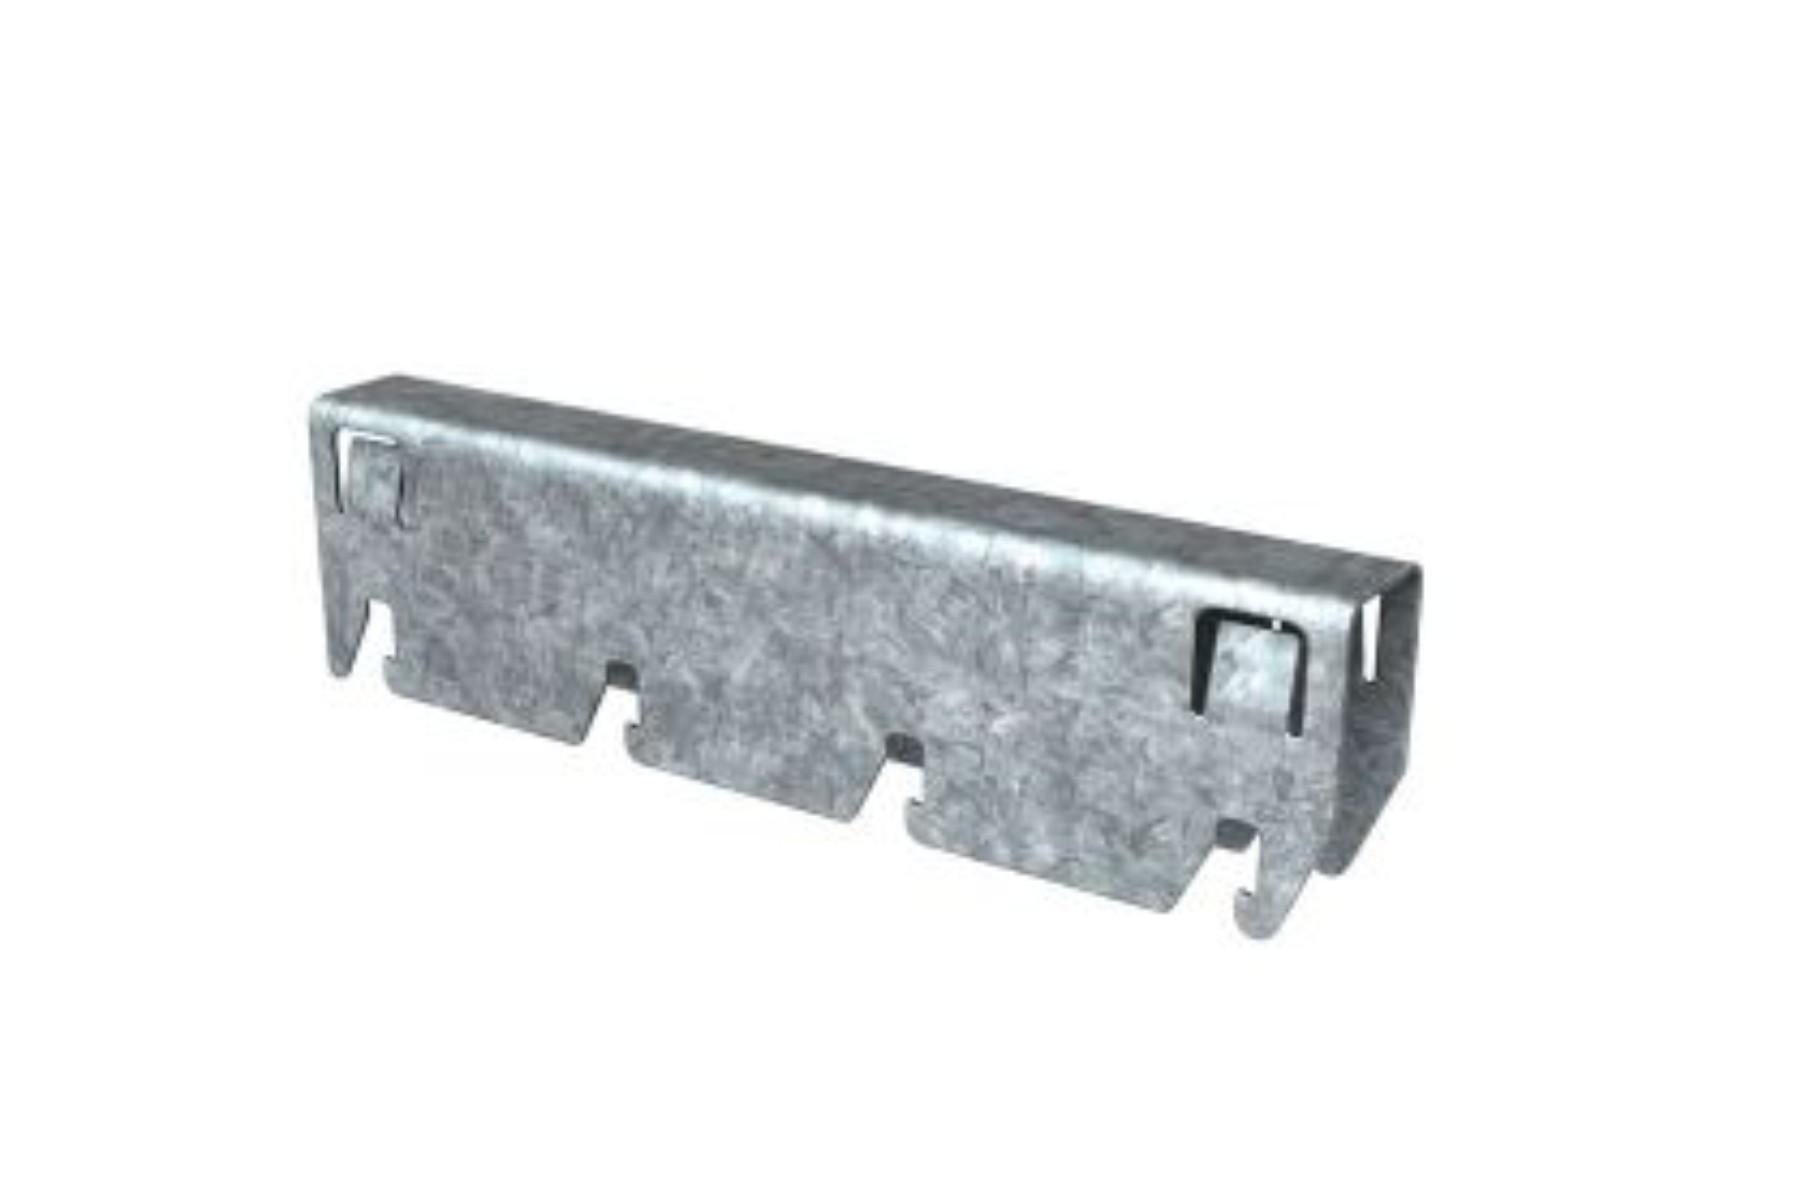 Linear Slot Diffuser 4 : Rondo linear diffuser spacer